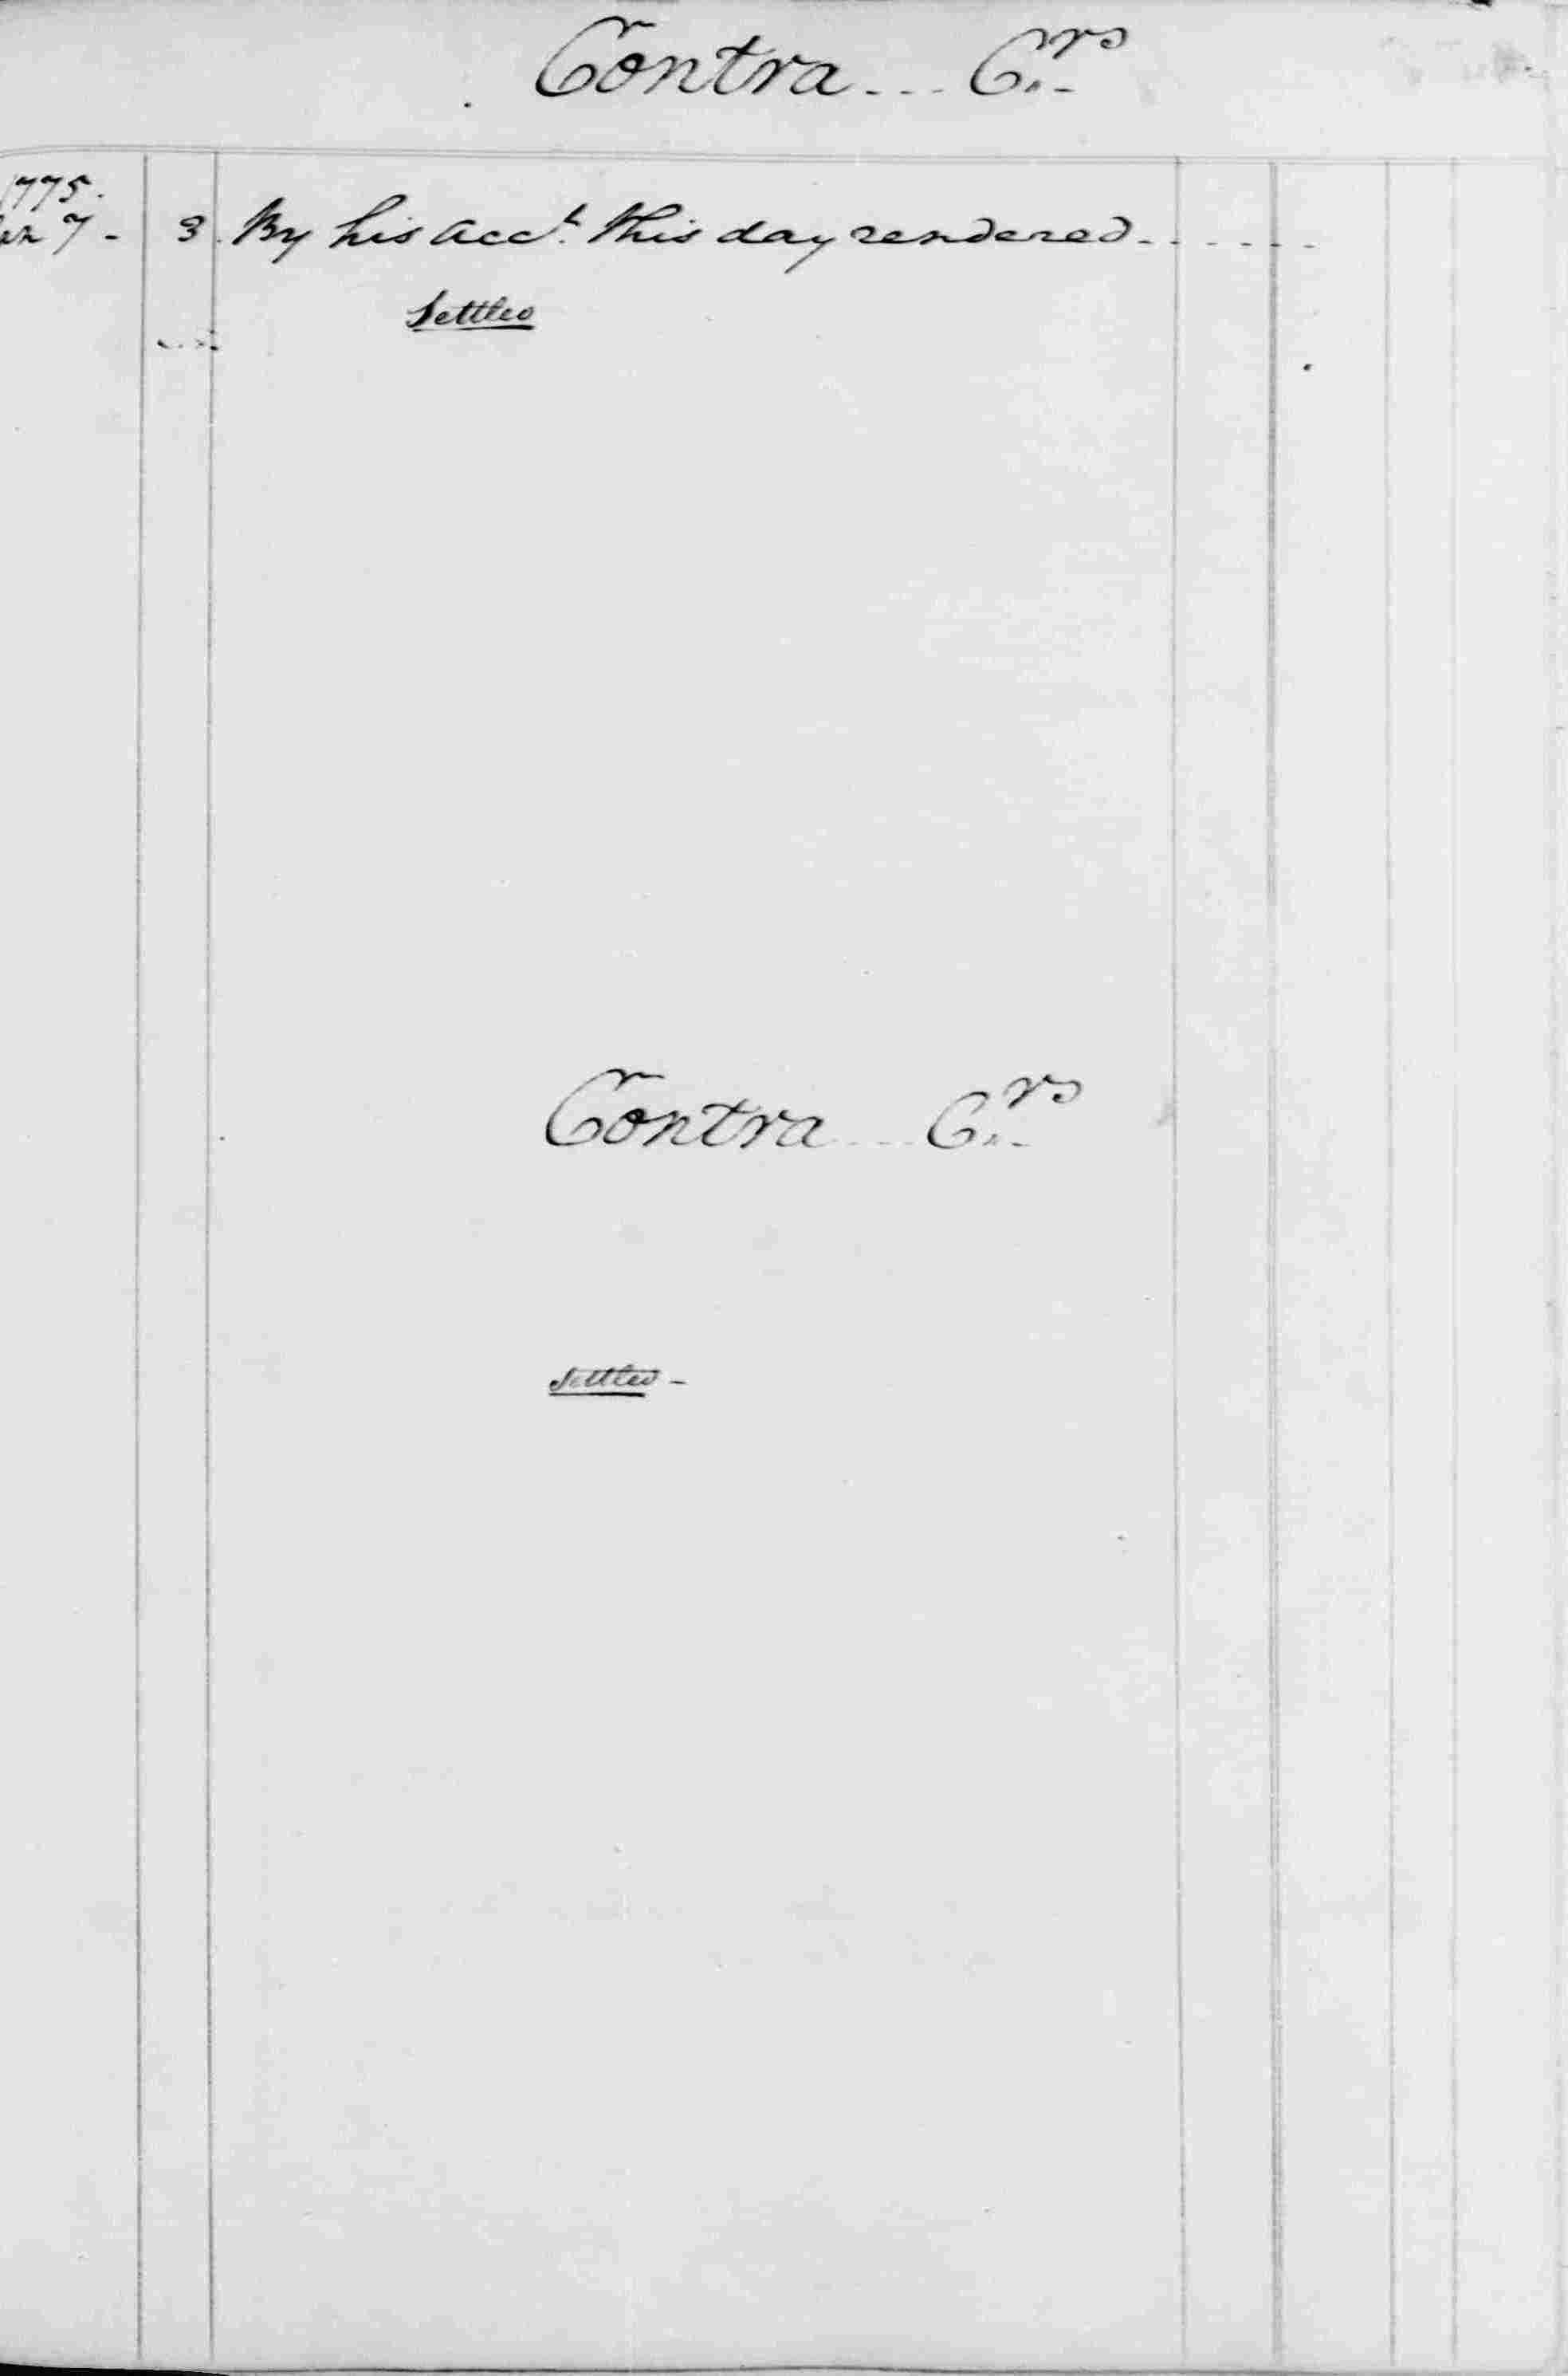 Ledger B, folio 103, right side